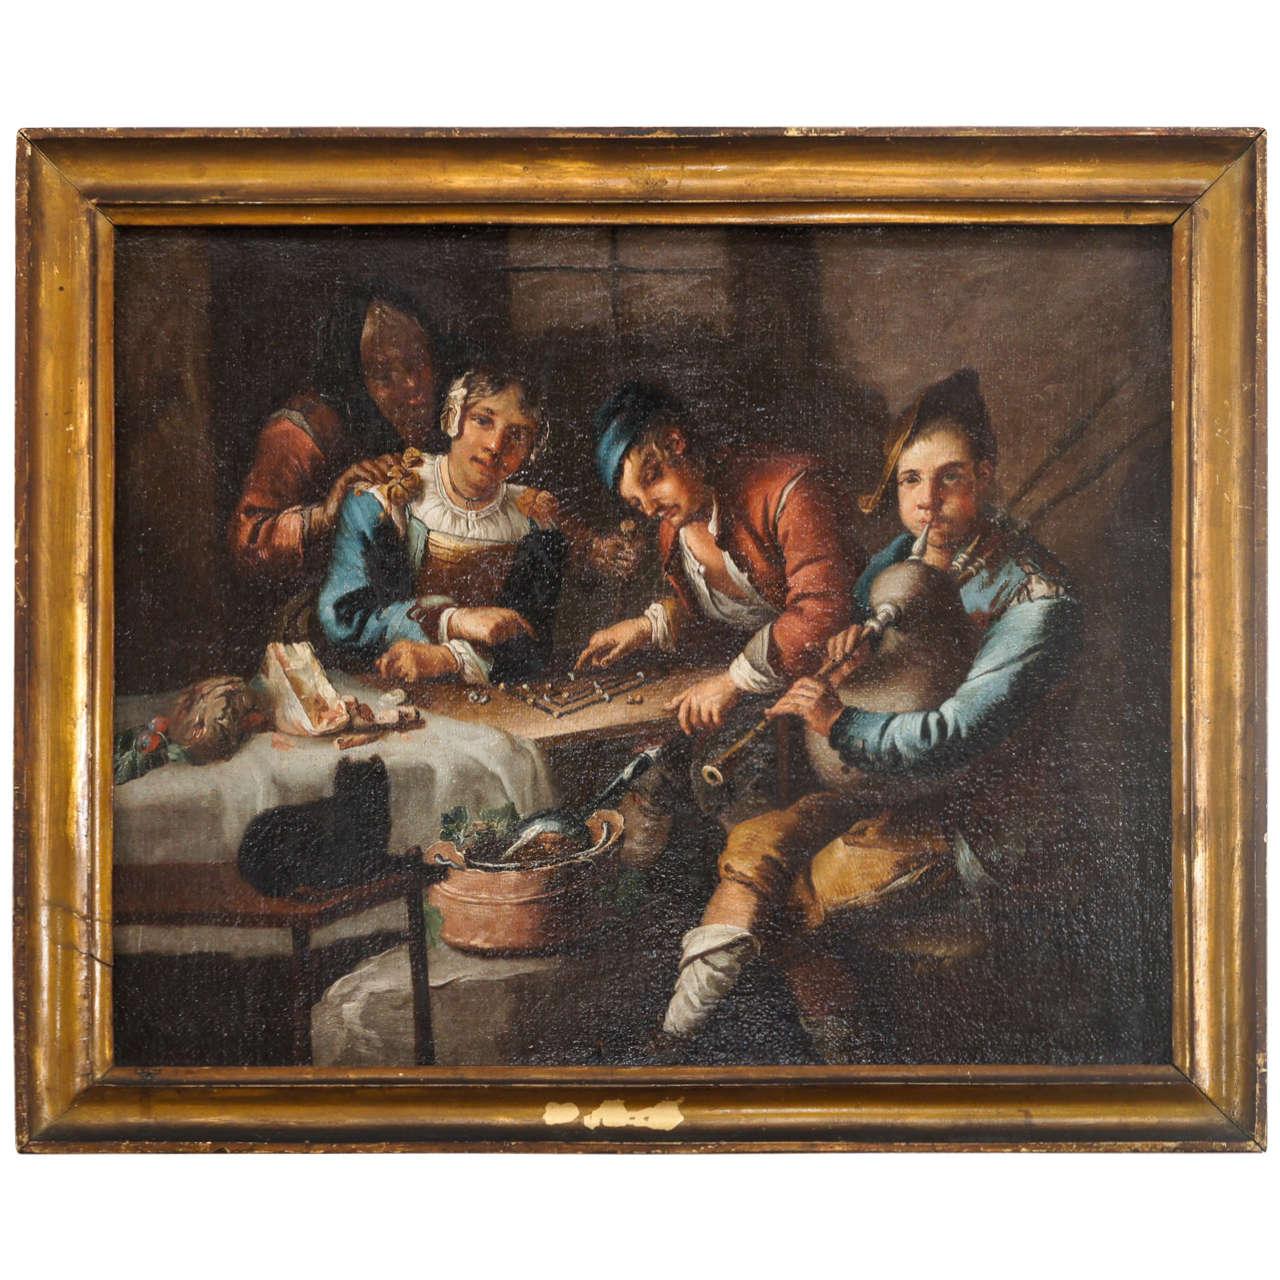 Dutch Or Flemish Genre Painting Circle Of Adriaen Brouwer